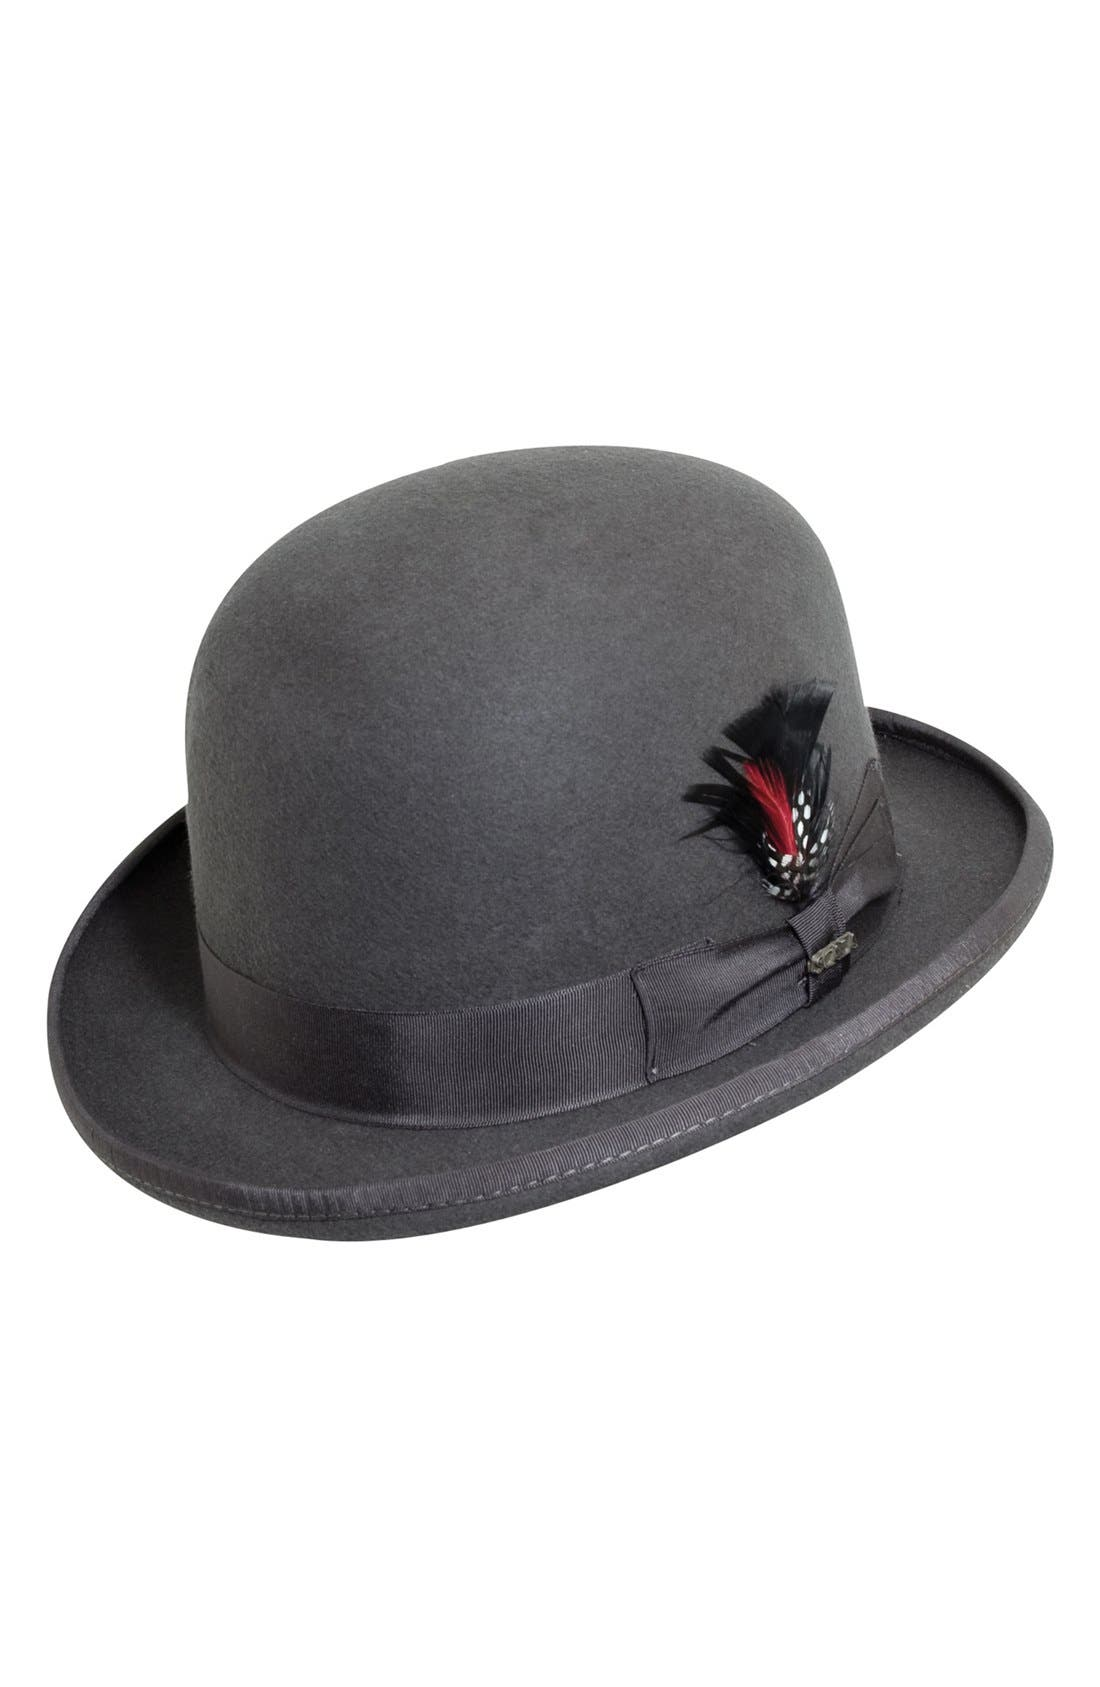 'Classico' Wool Felt Derby Hat,                             Main thumbnail 1, color,                             CHARCOAL